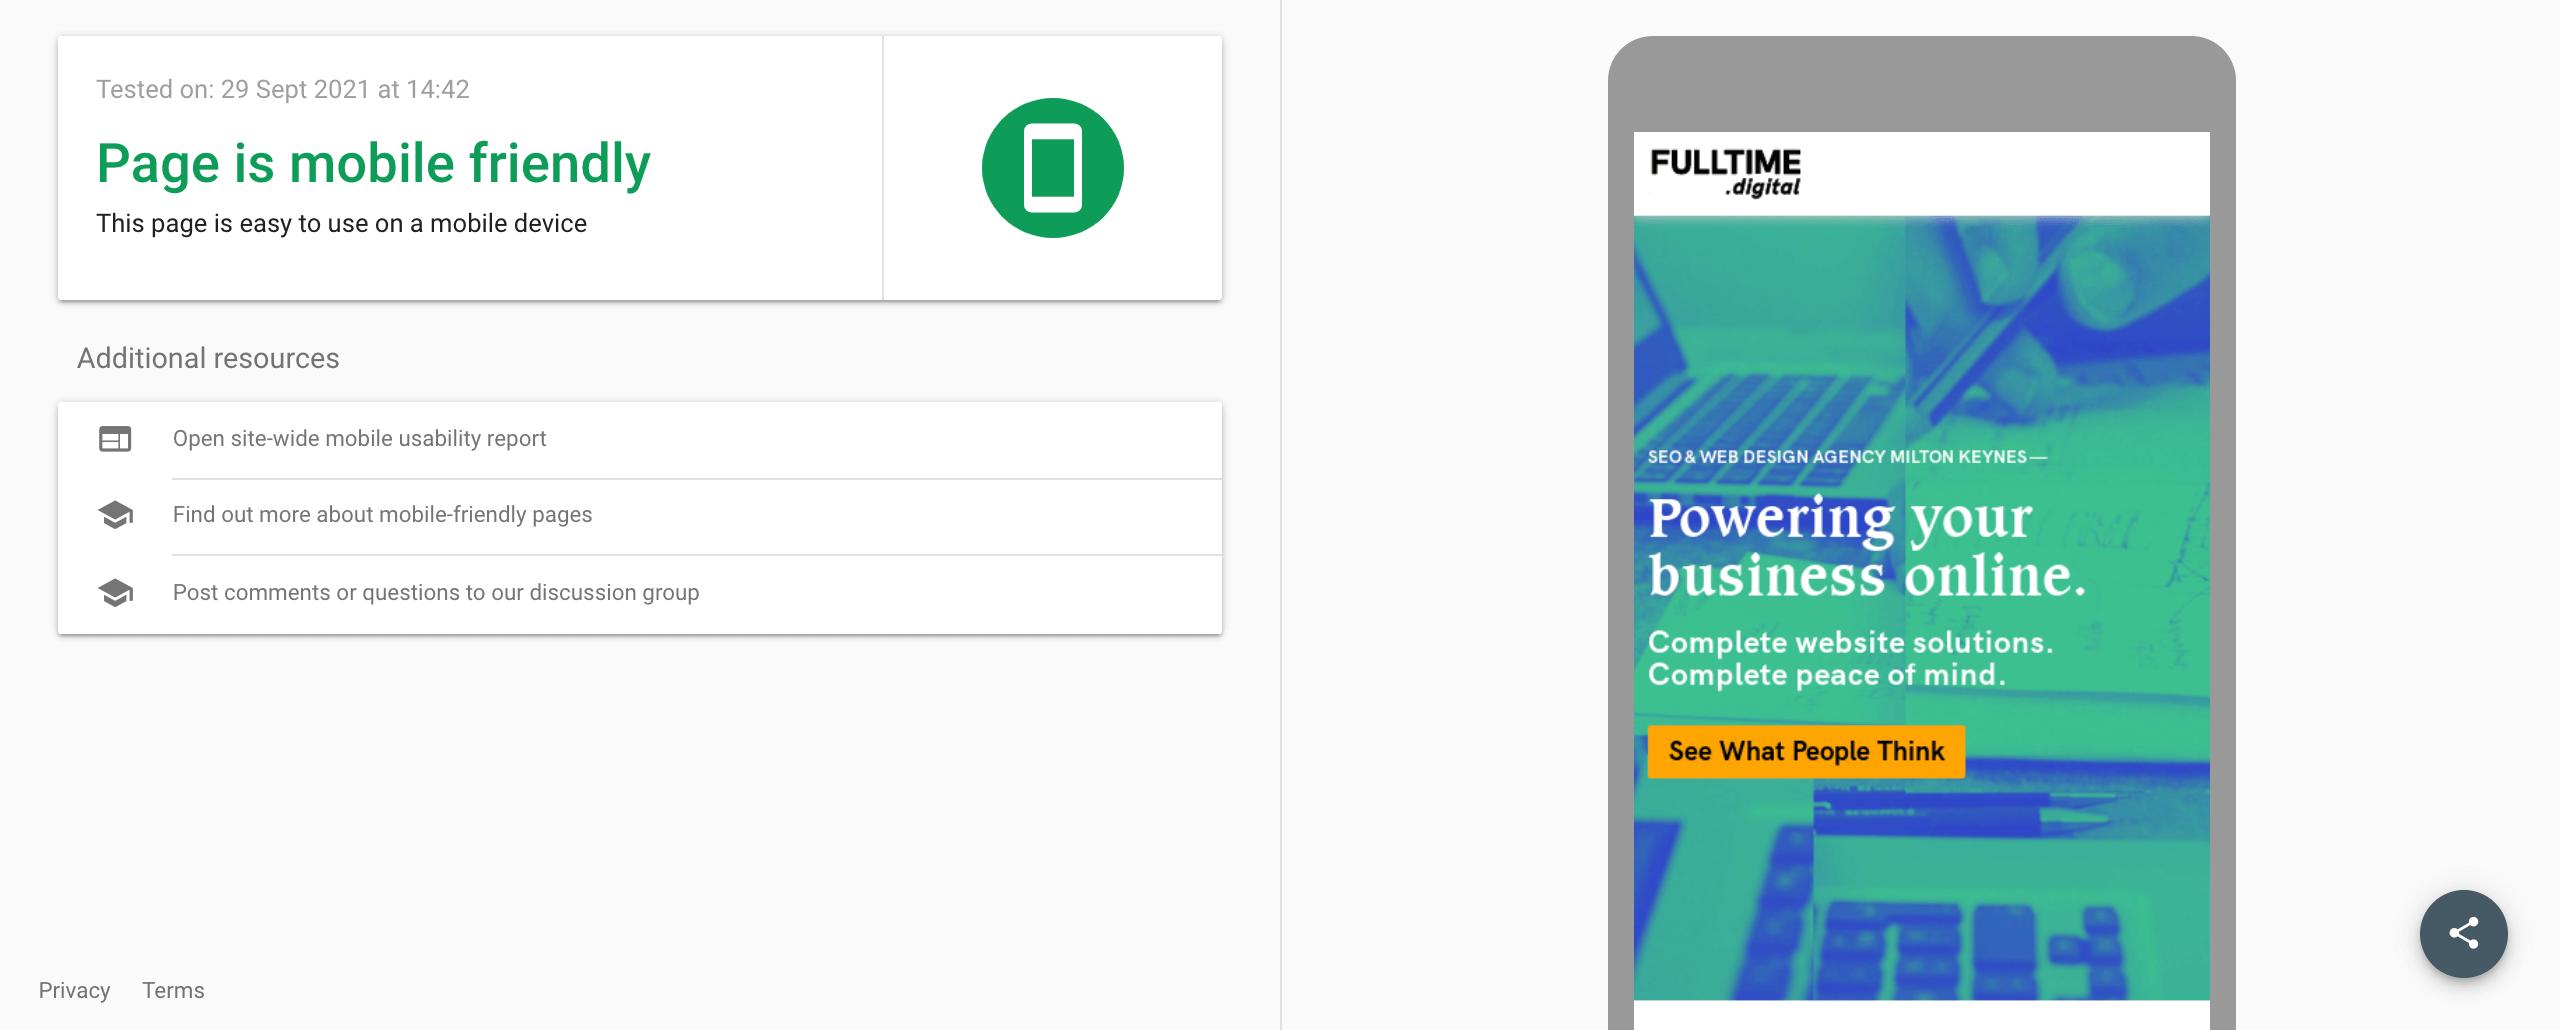 fulltime digital mobile friendly website test